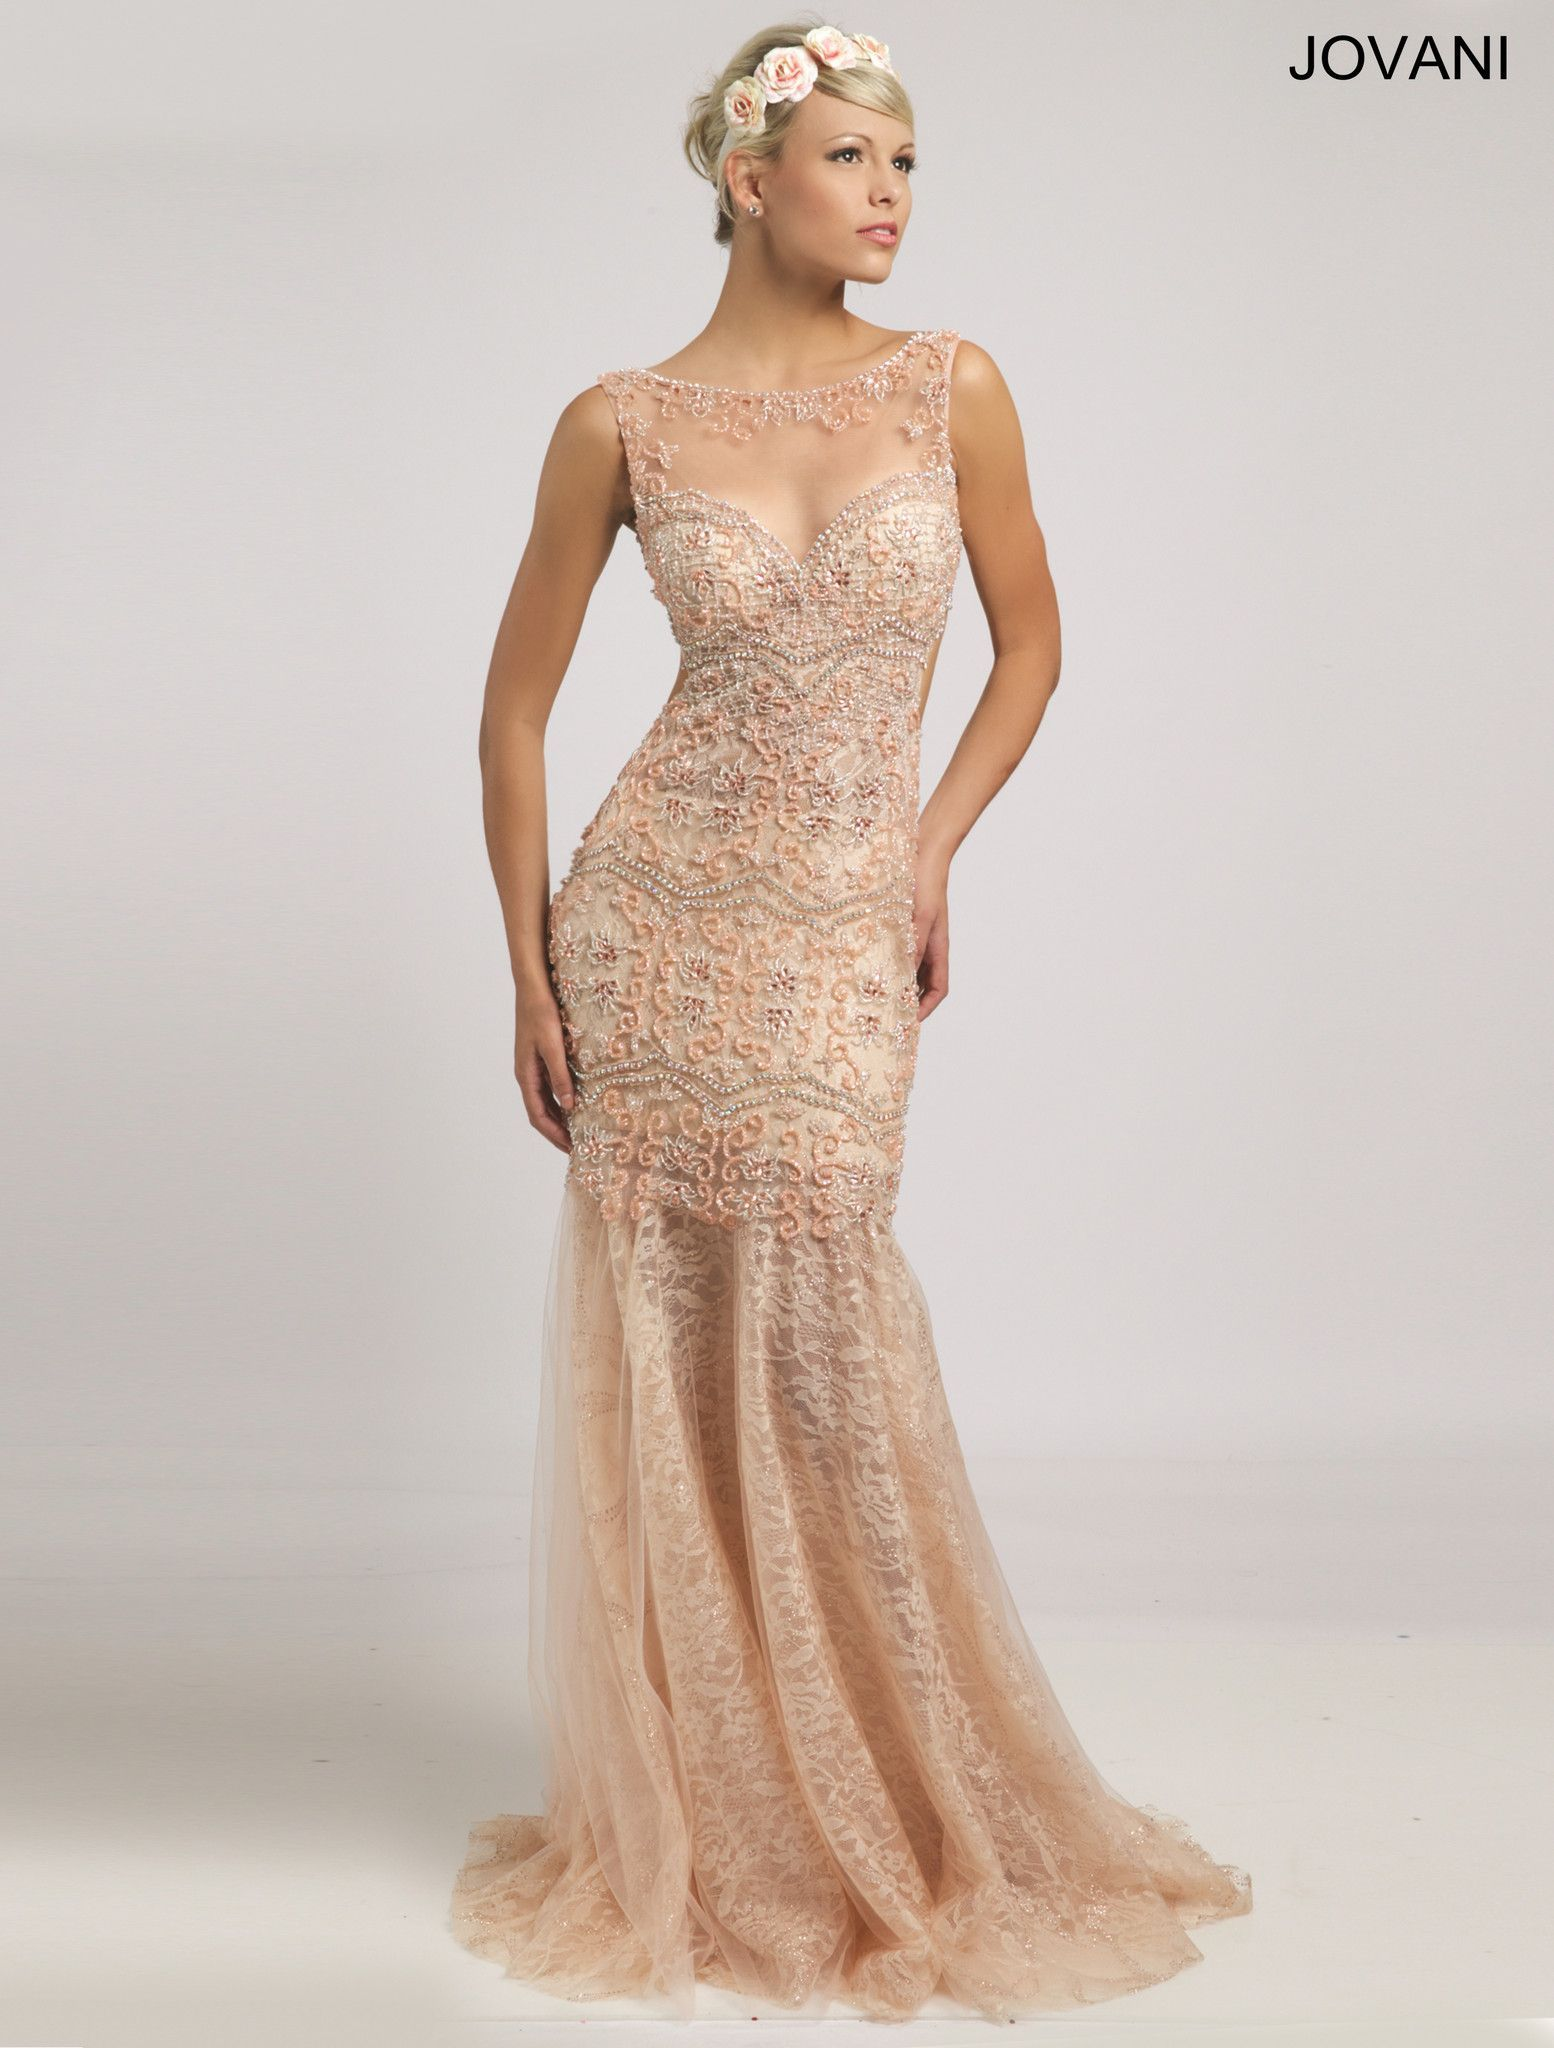 Jovani 98054 BOHO Chic Beaded Lace Prom Wedding Dress Evening Gown ...